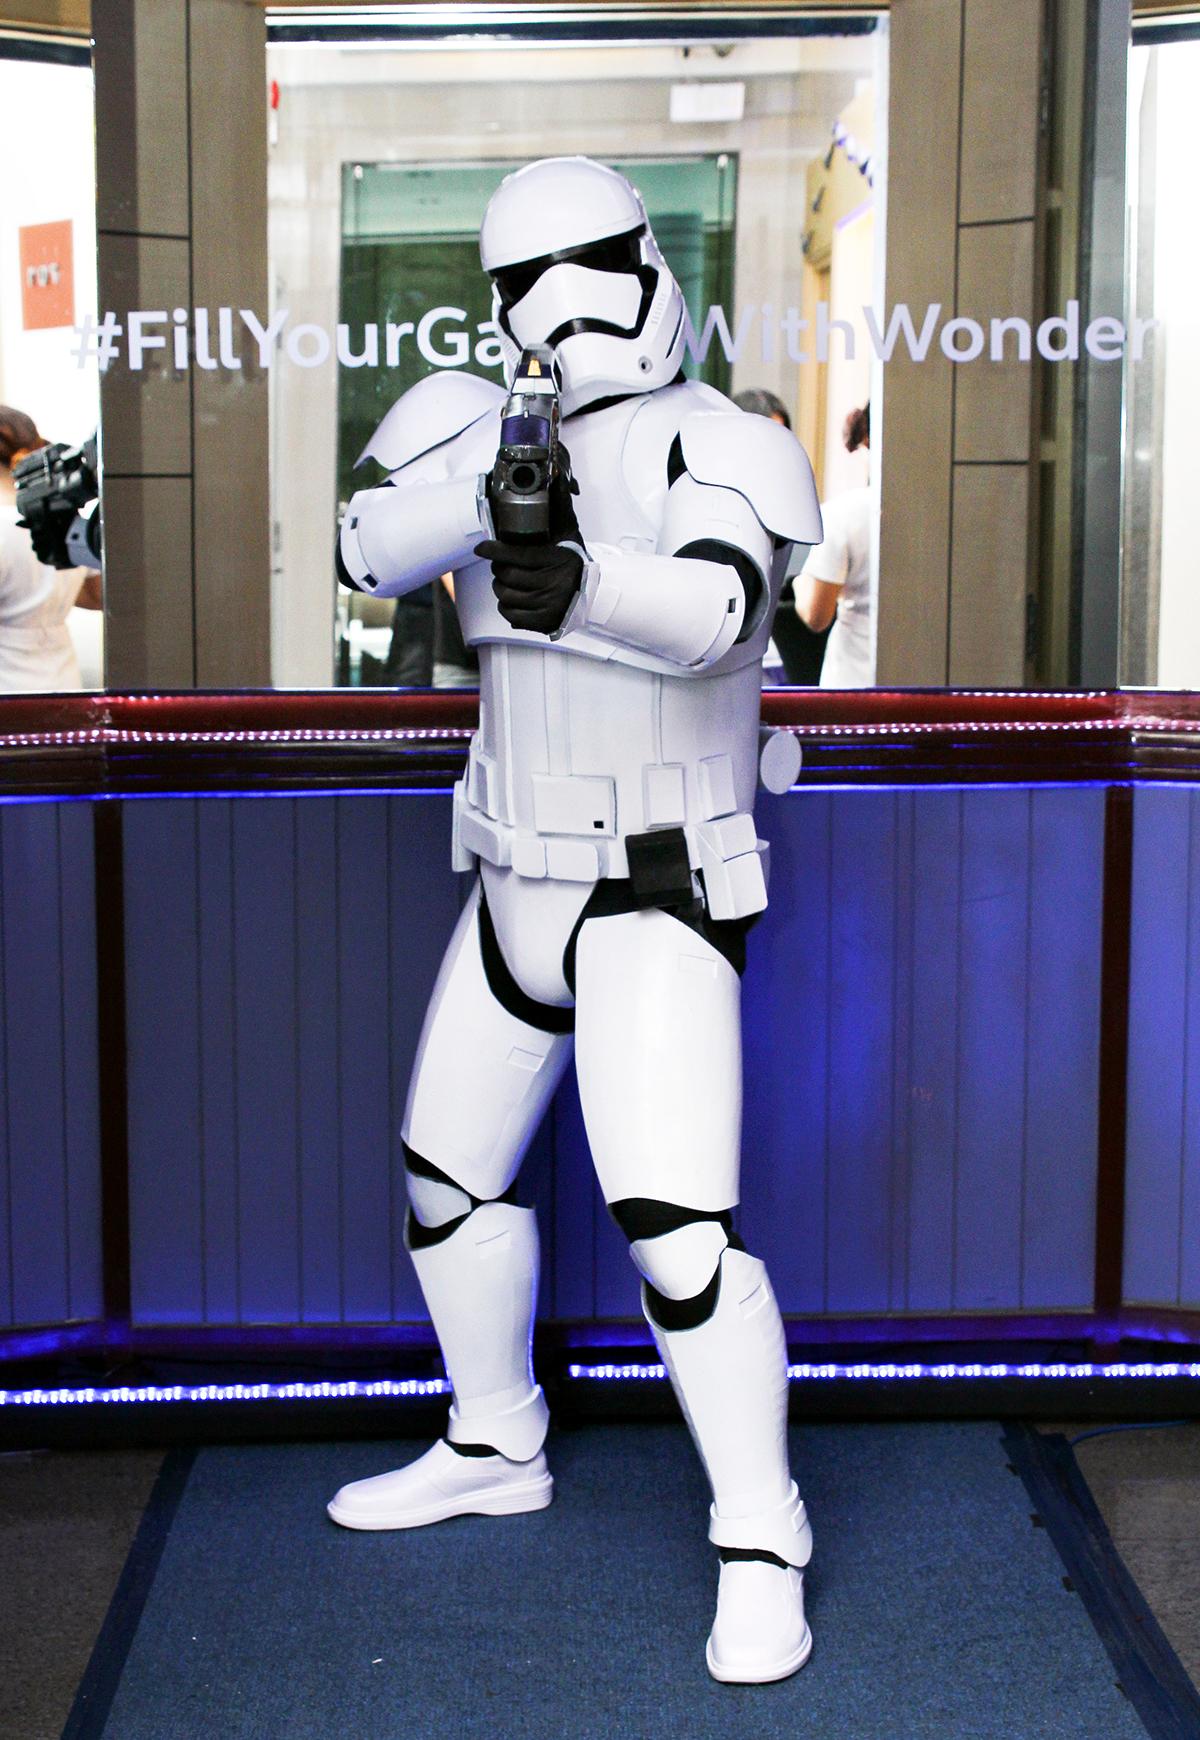 Galactic Digital Night Star Wars